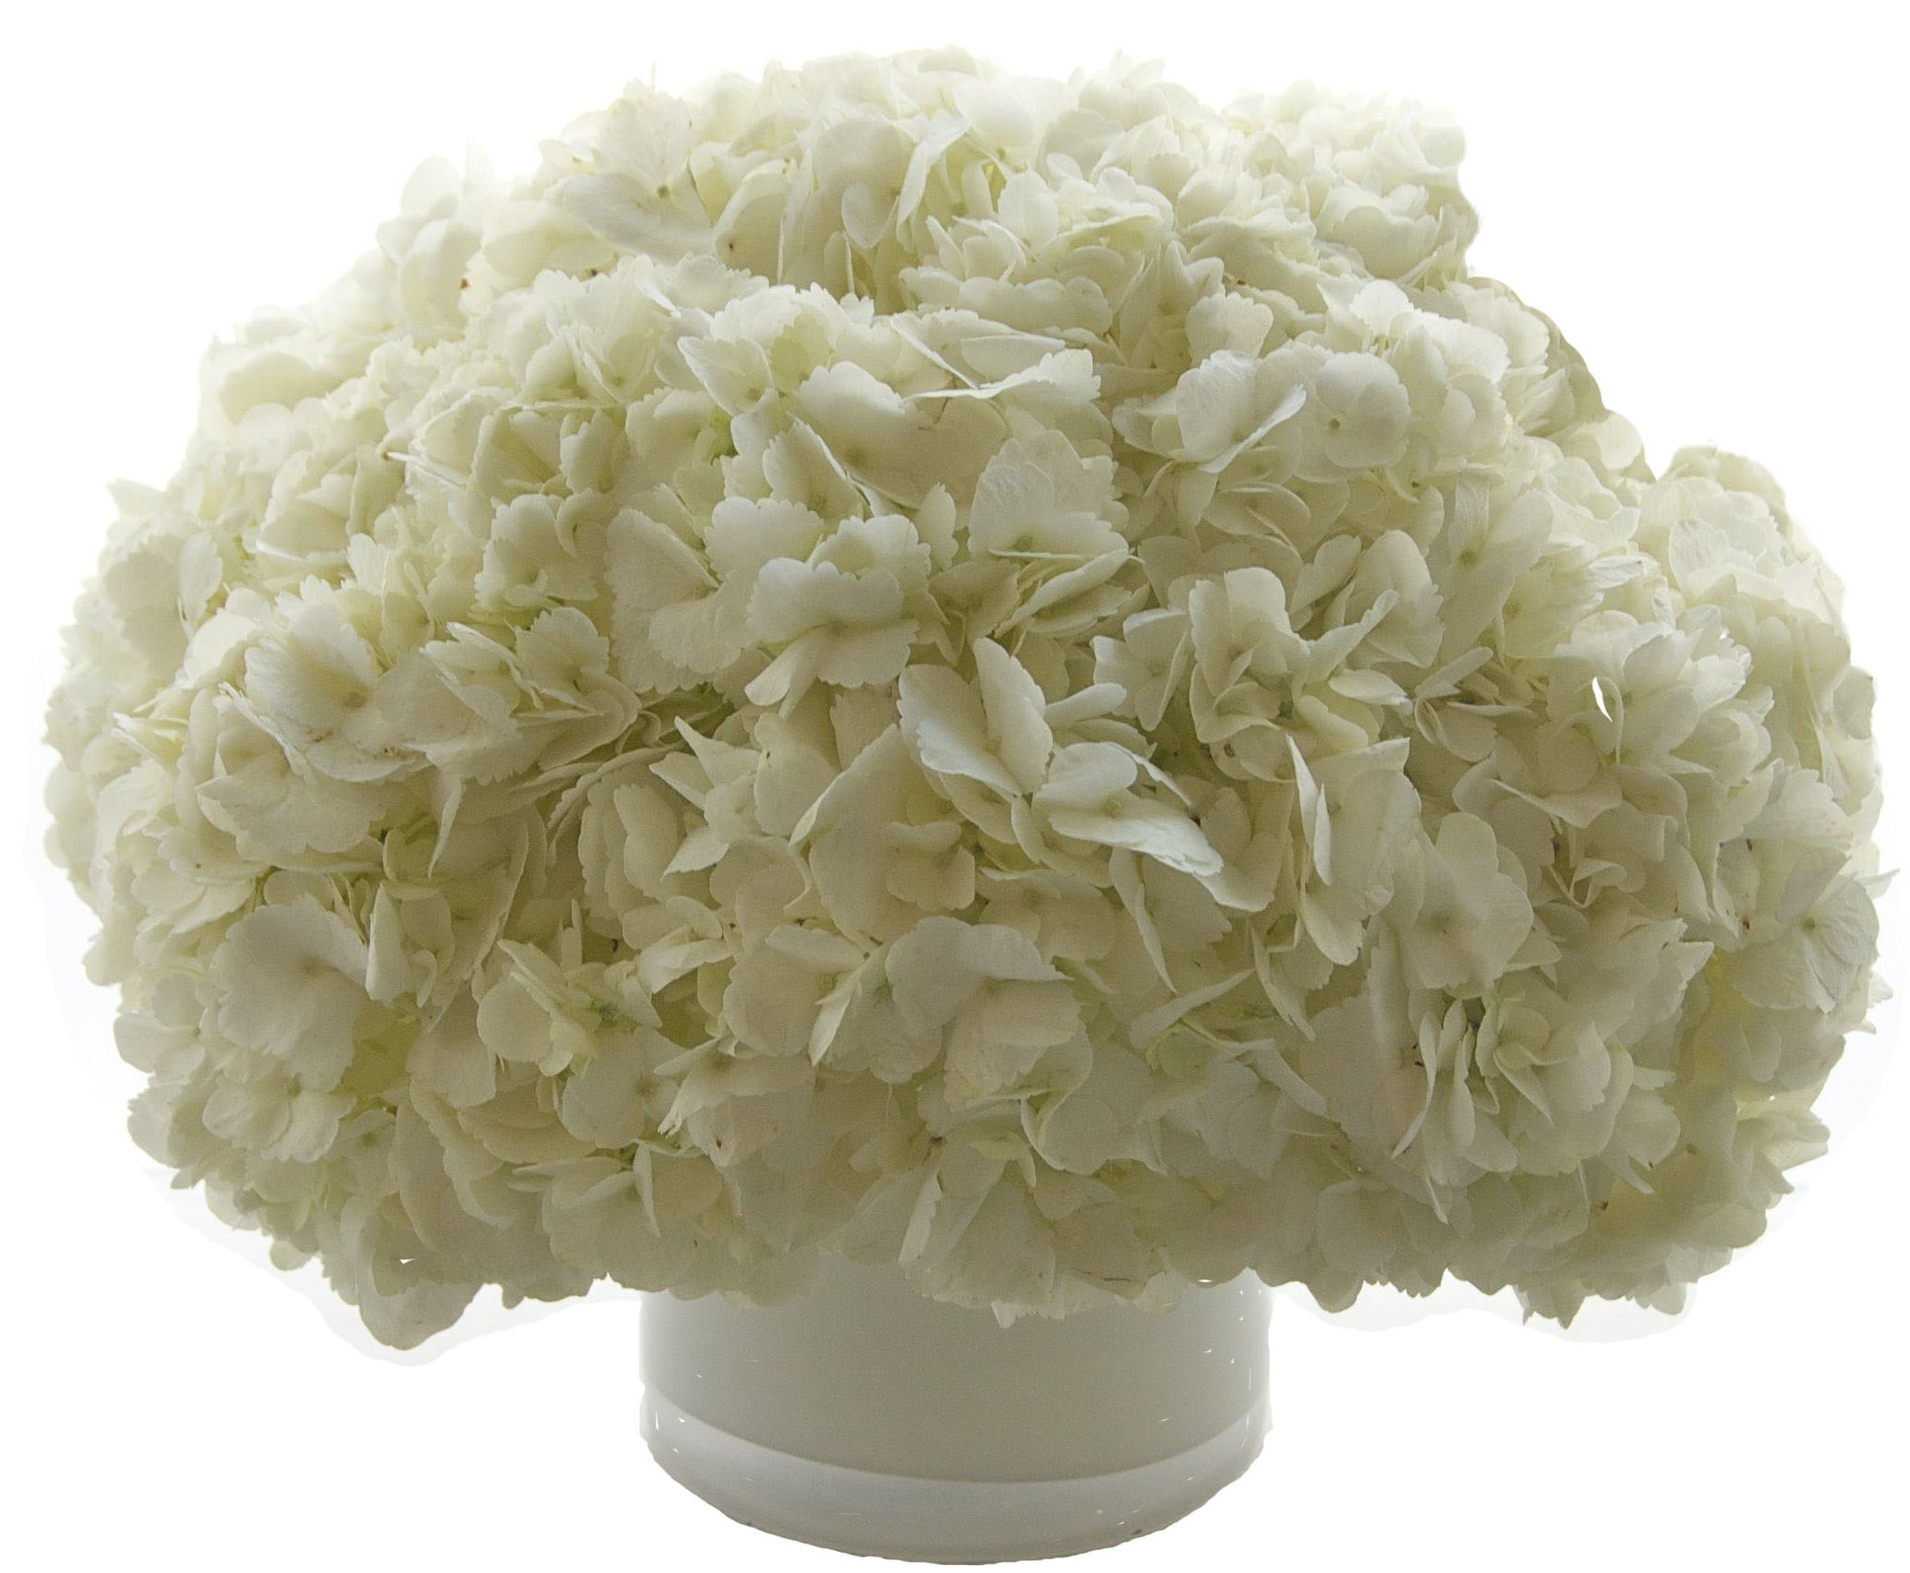 White Hydrangea starts at $100